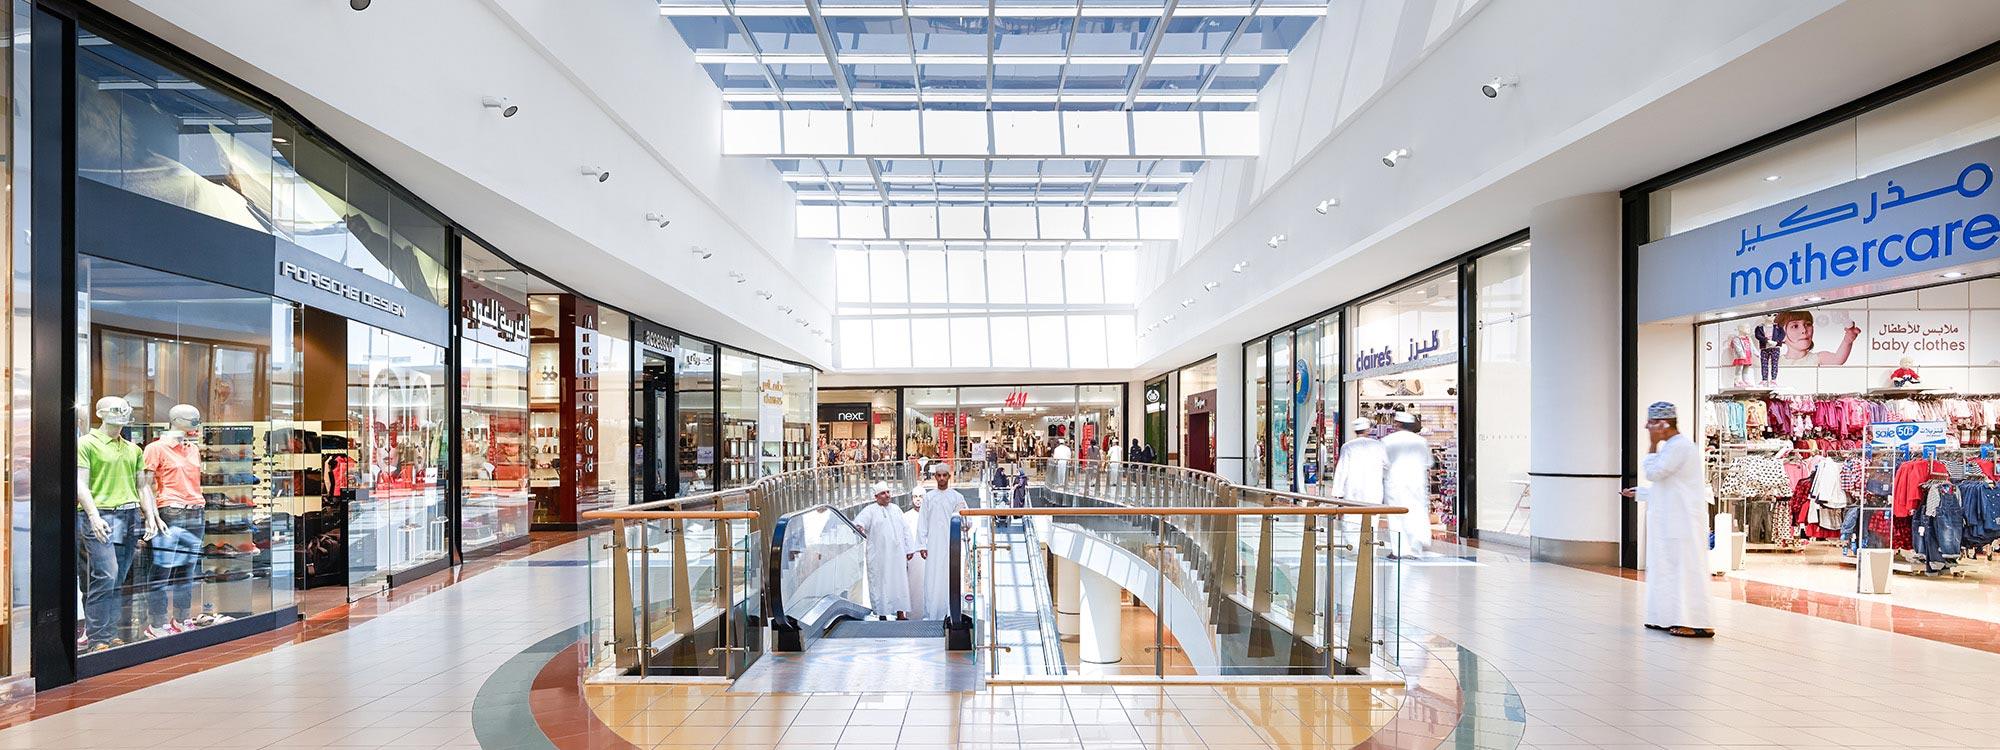 Mall - Shopping - Entertainment | City Center Qurum